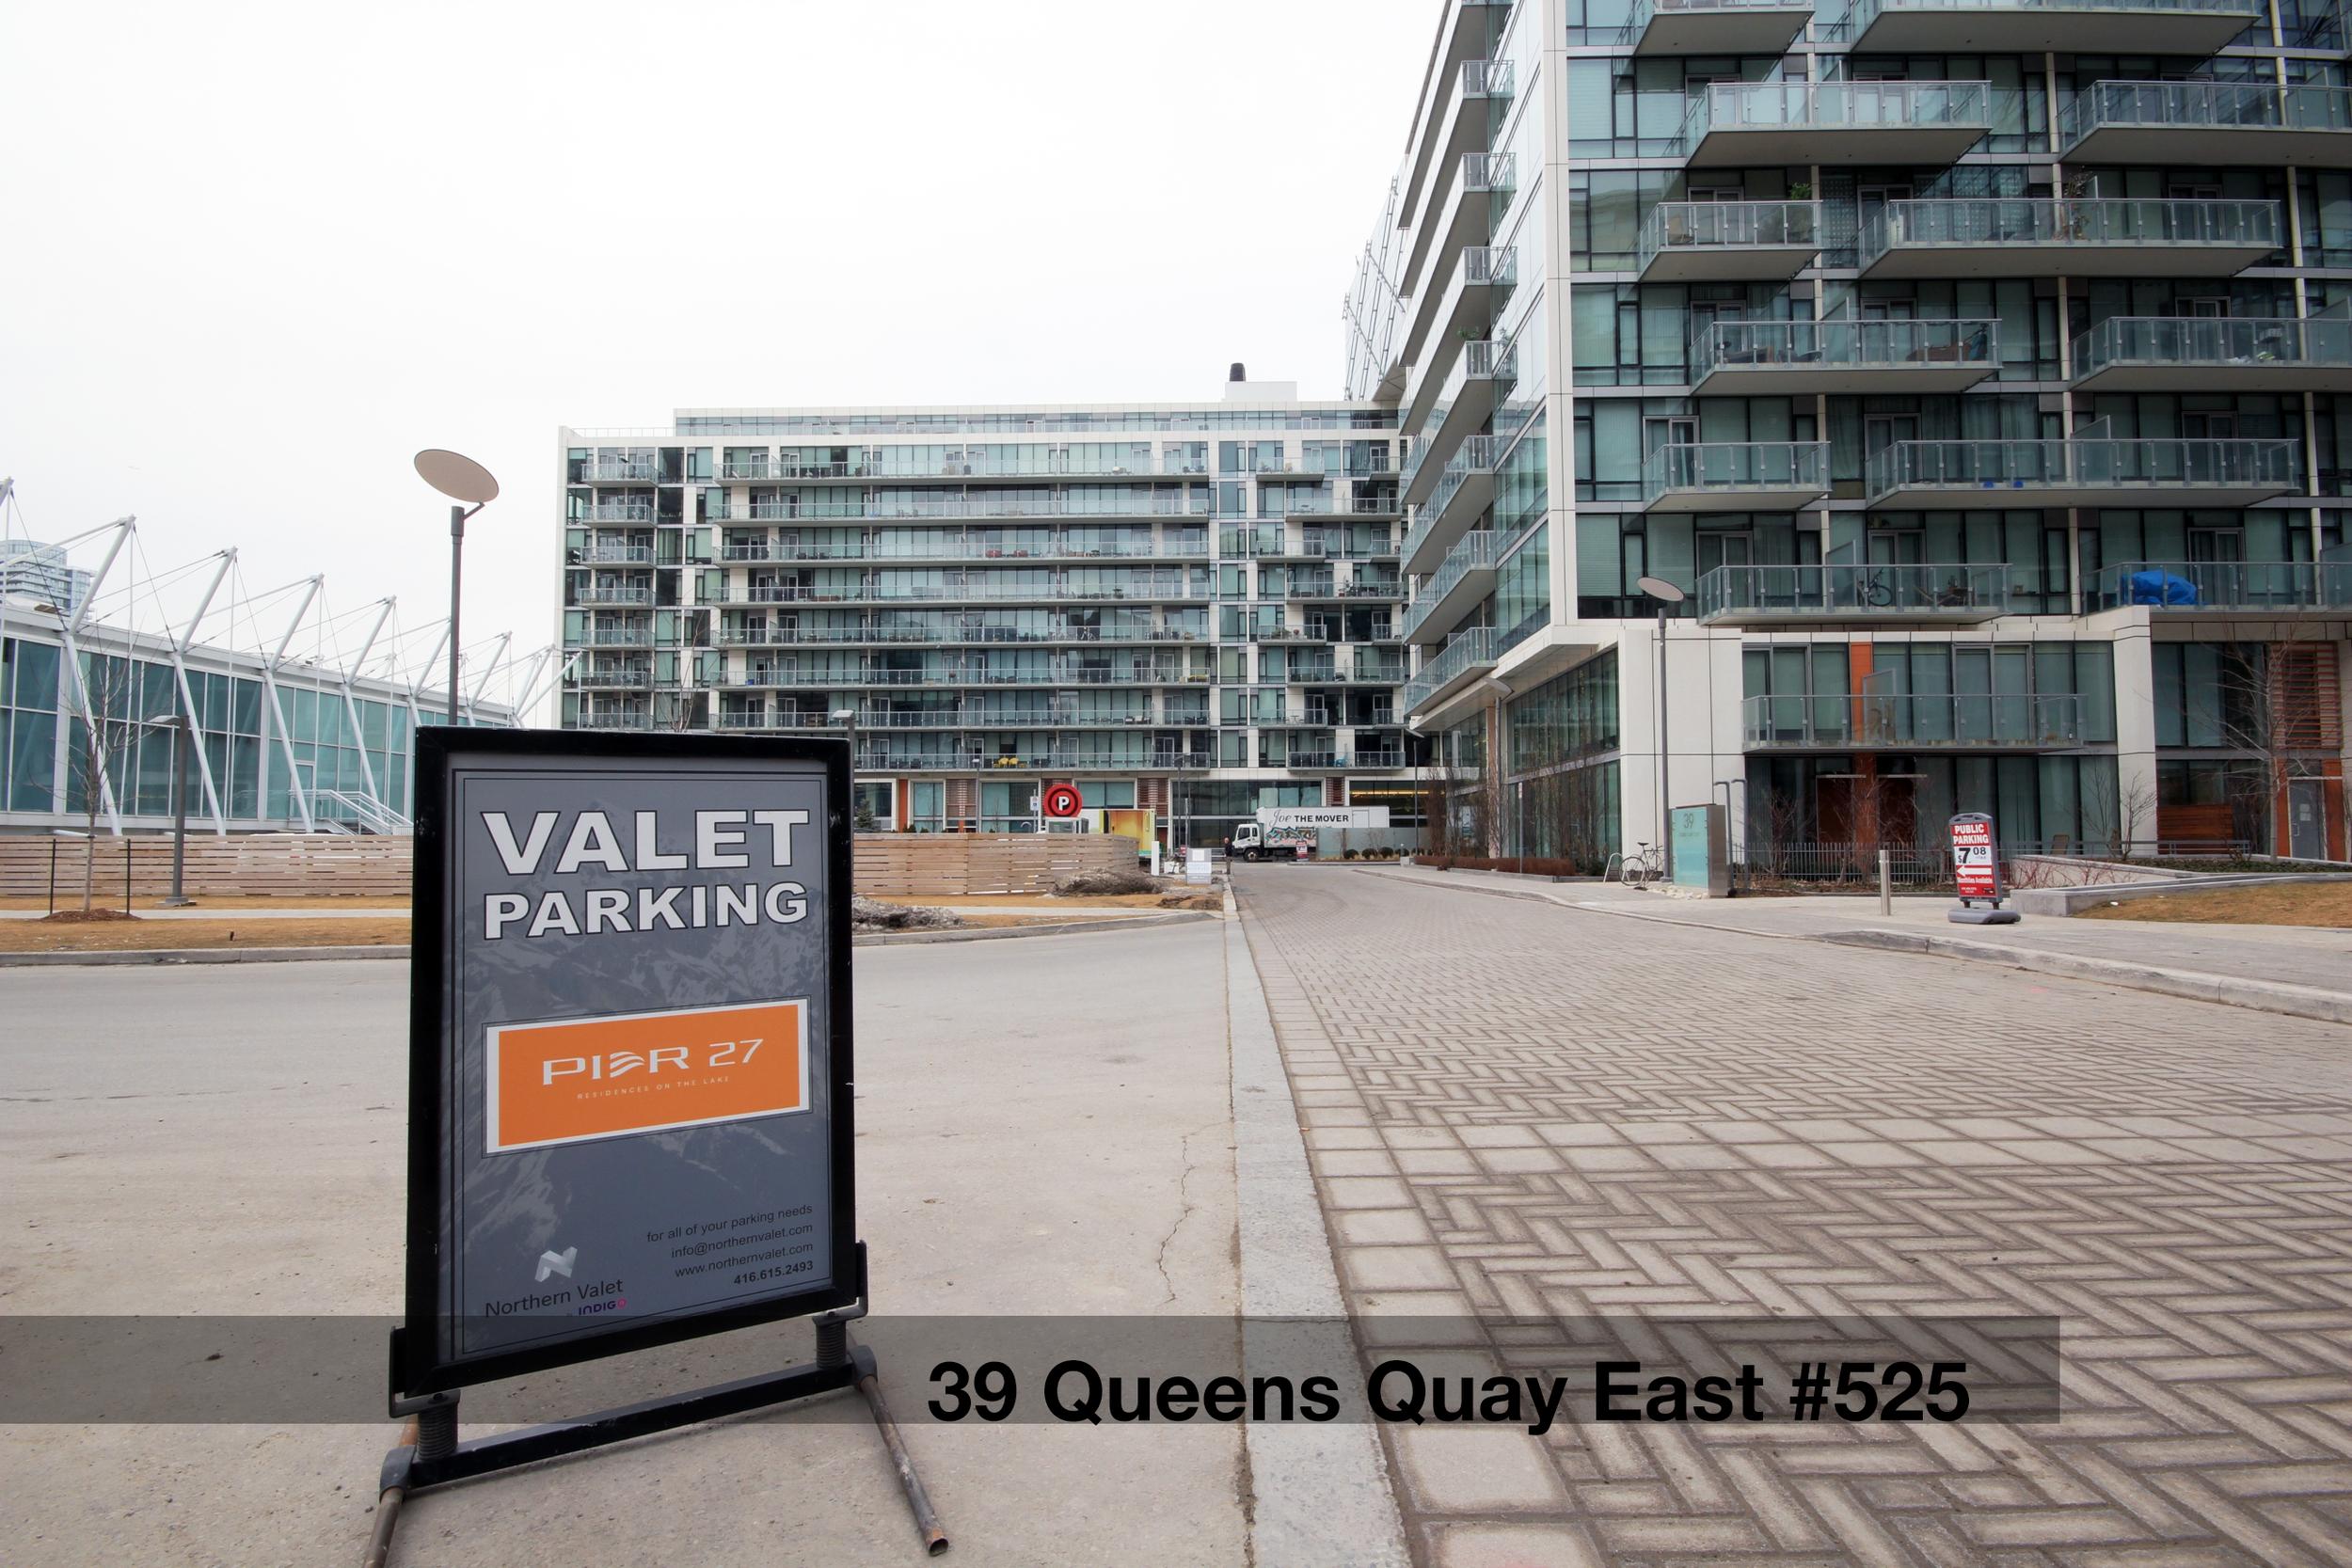 20 Valet Parking copy.jpg